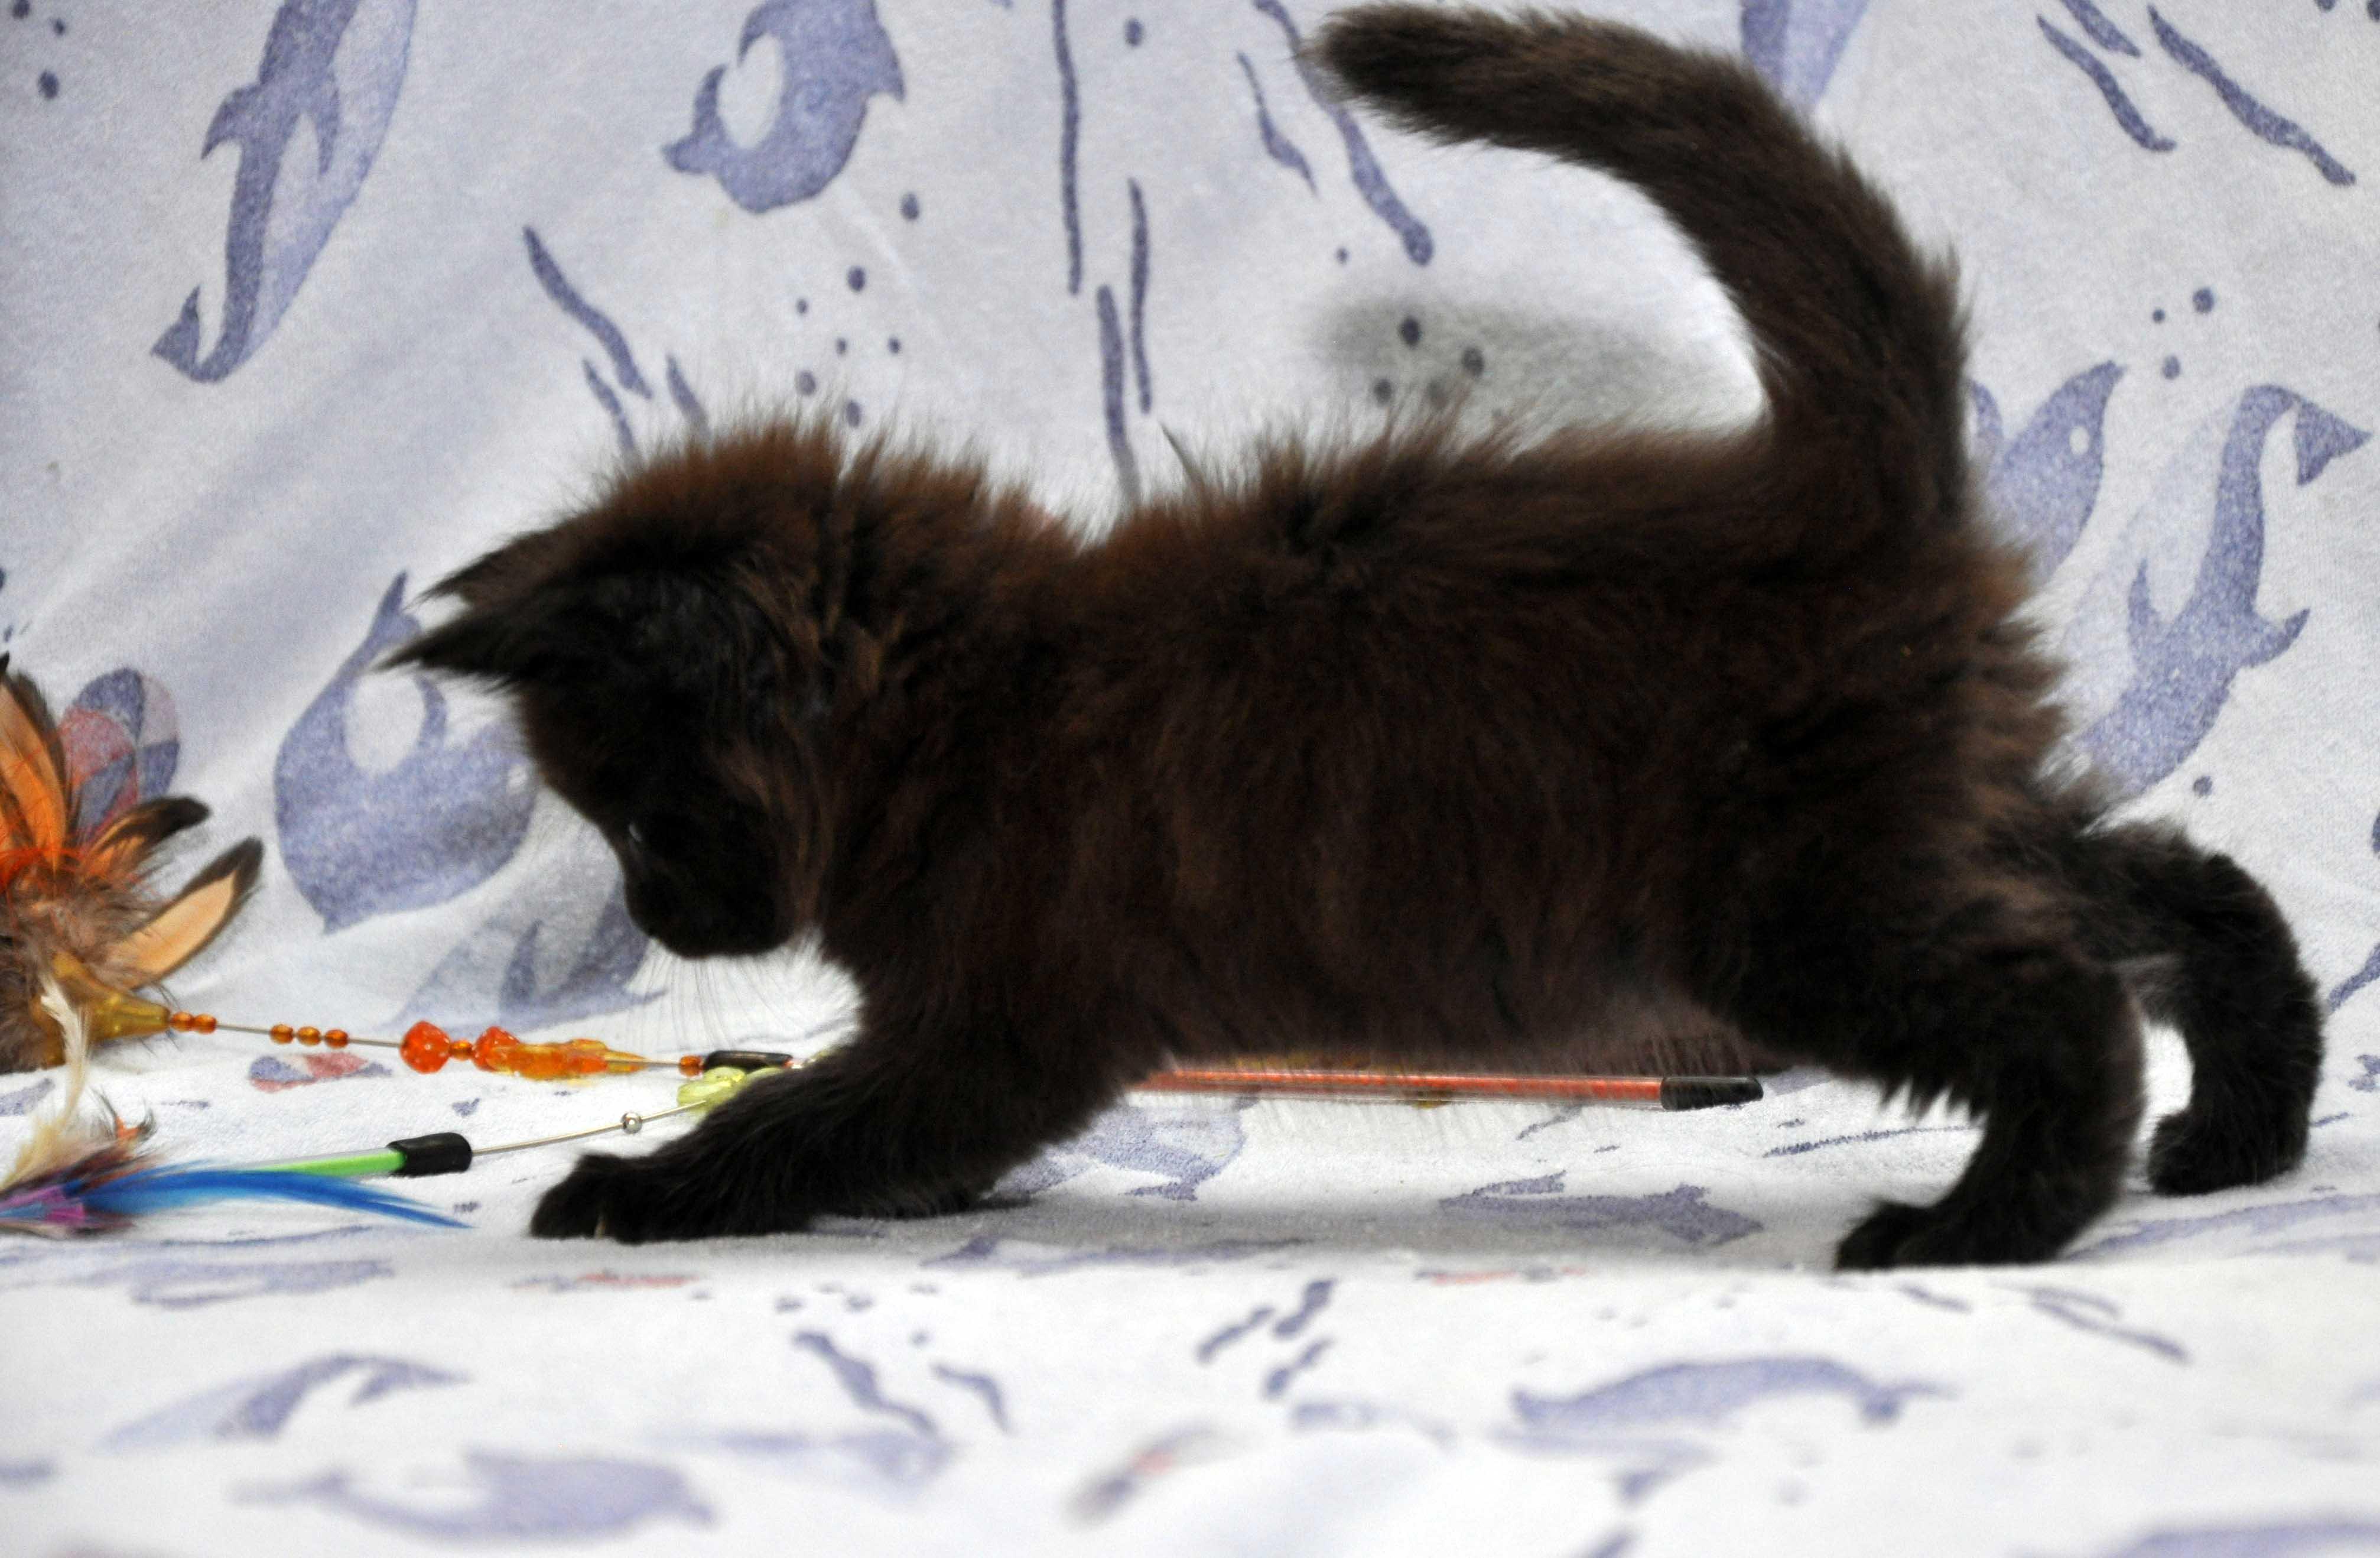 Кот Мейн Кун 3 (male) Eyktan QUAKE фото 8